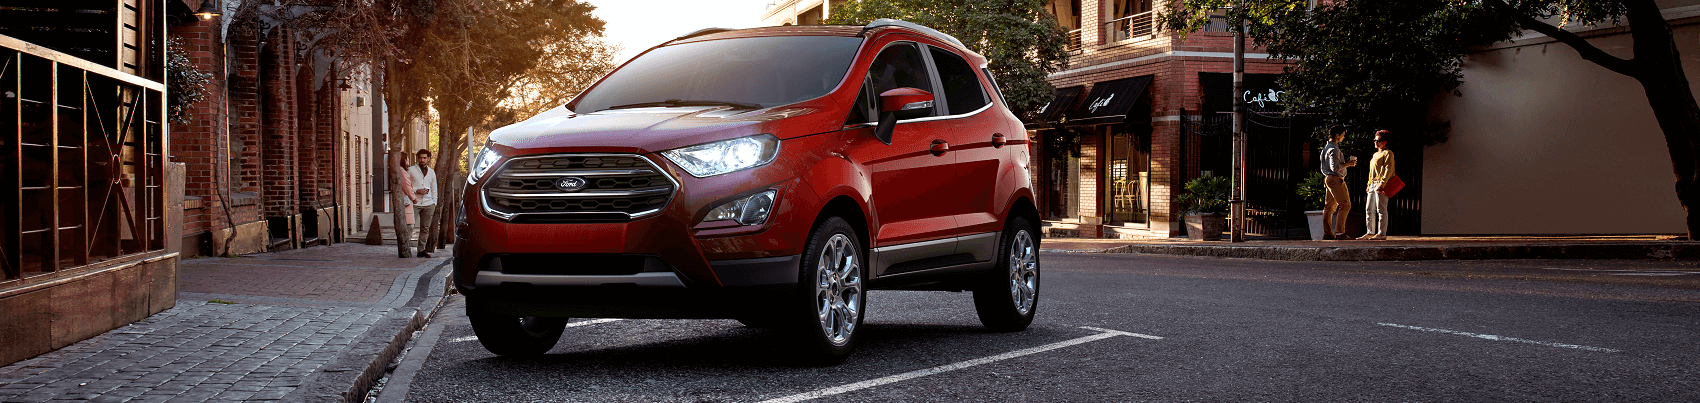 Ford EcoSport Middletown DE